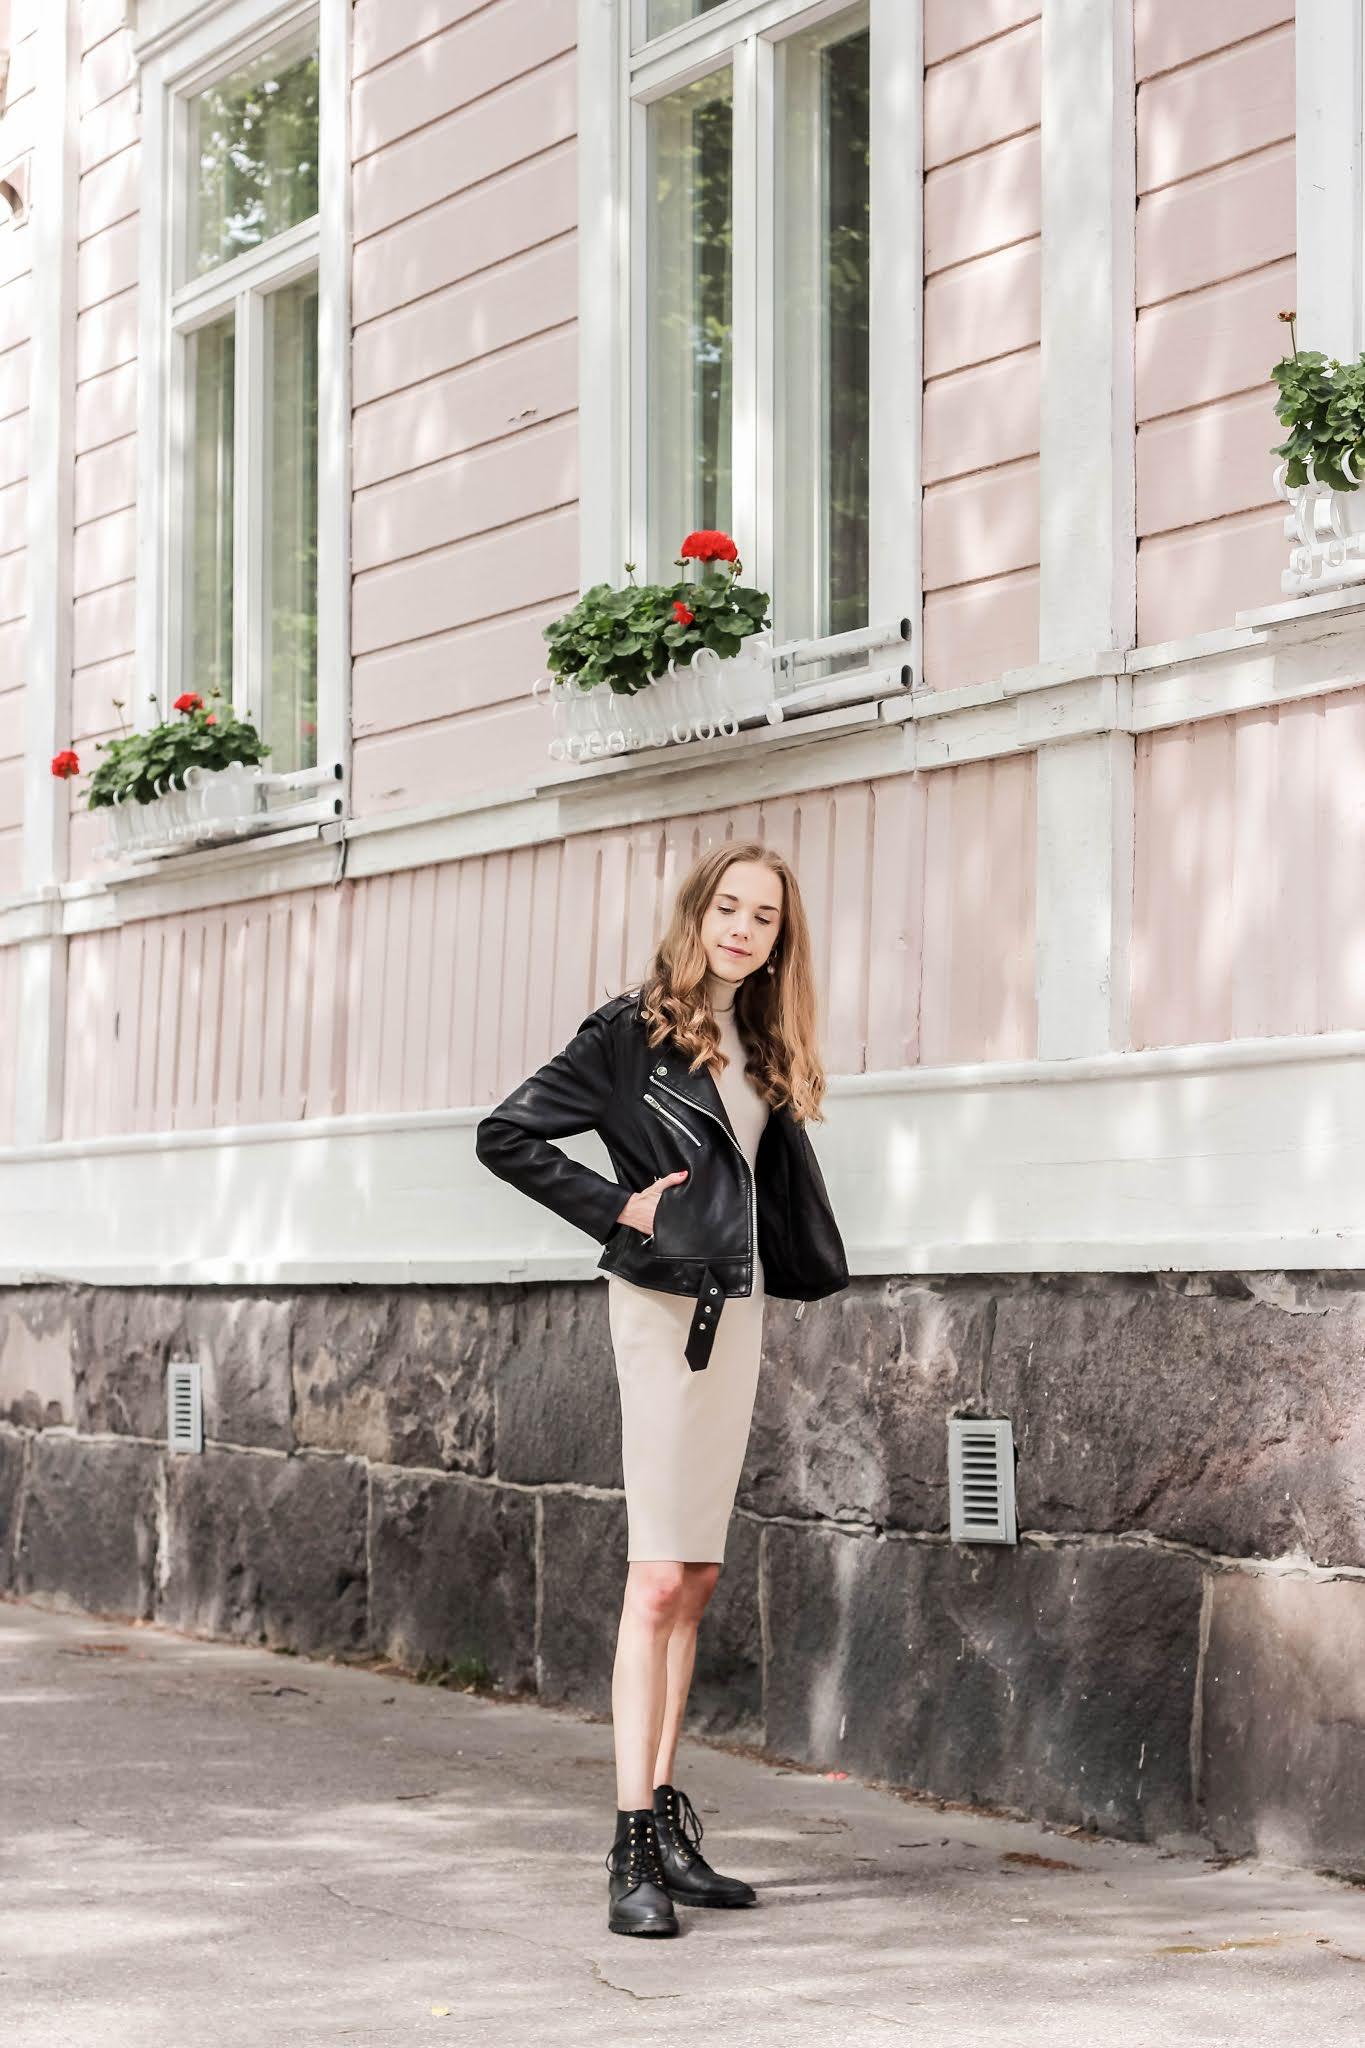 Fashion blogger outfit with beige jumper dress and leather jacket - Muotibloggaaja, asuinspiraatio, beige neulemekko, nahkatakki